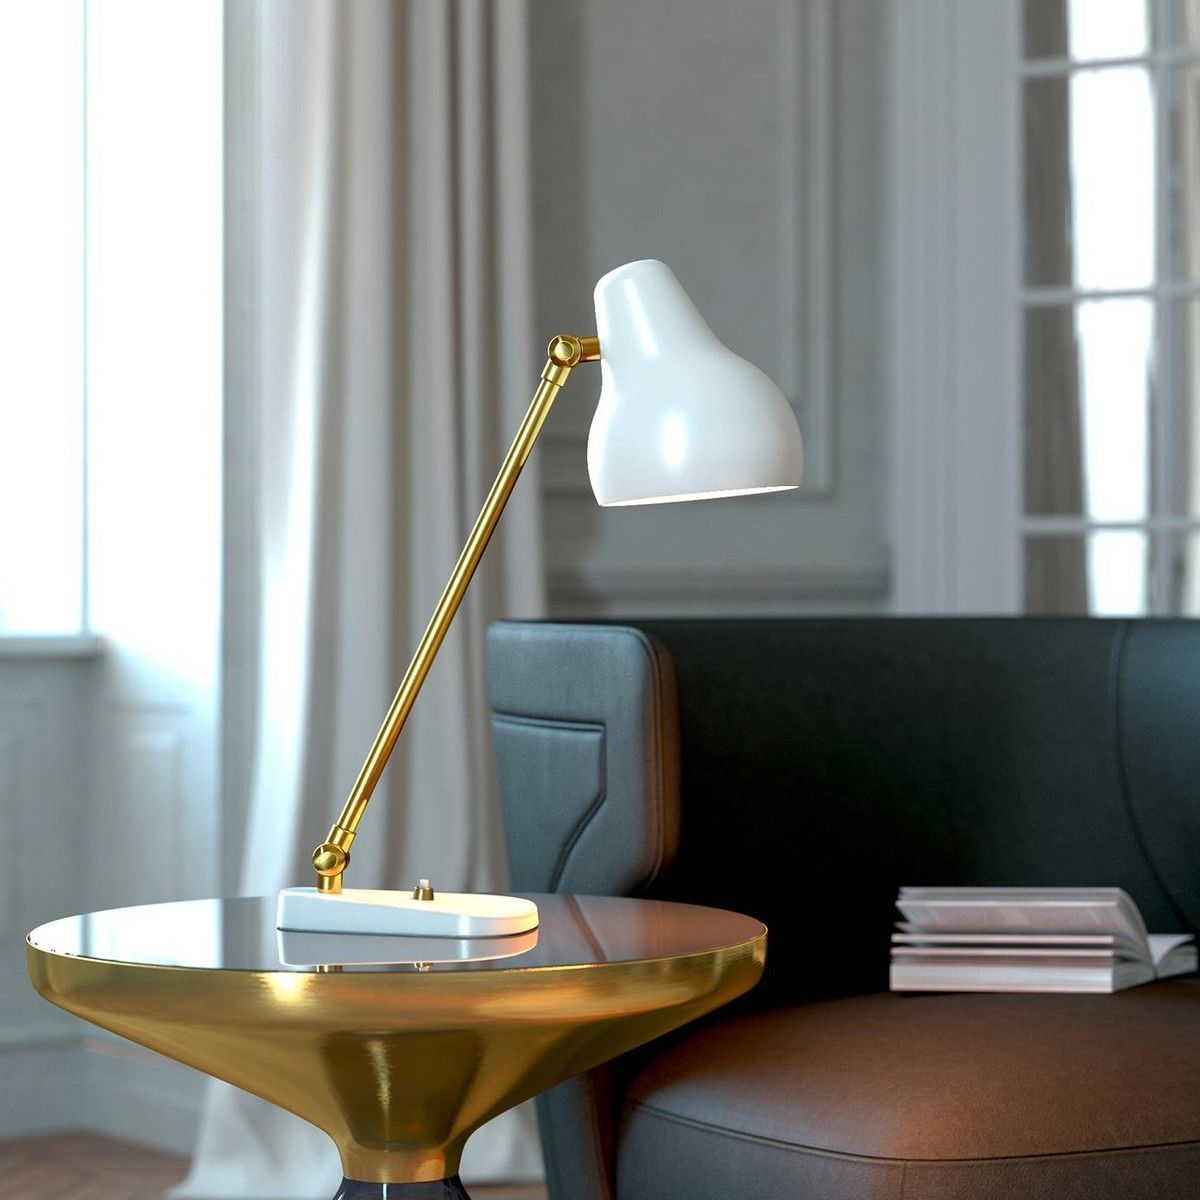 vl38 led table lamp louis poulsen. Black Bedroom Furniture Sets. Home Design Ideas